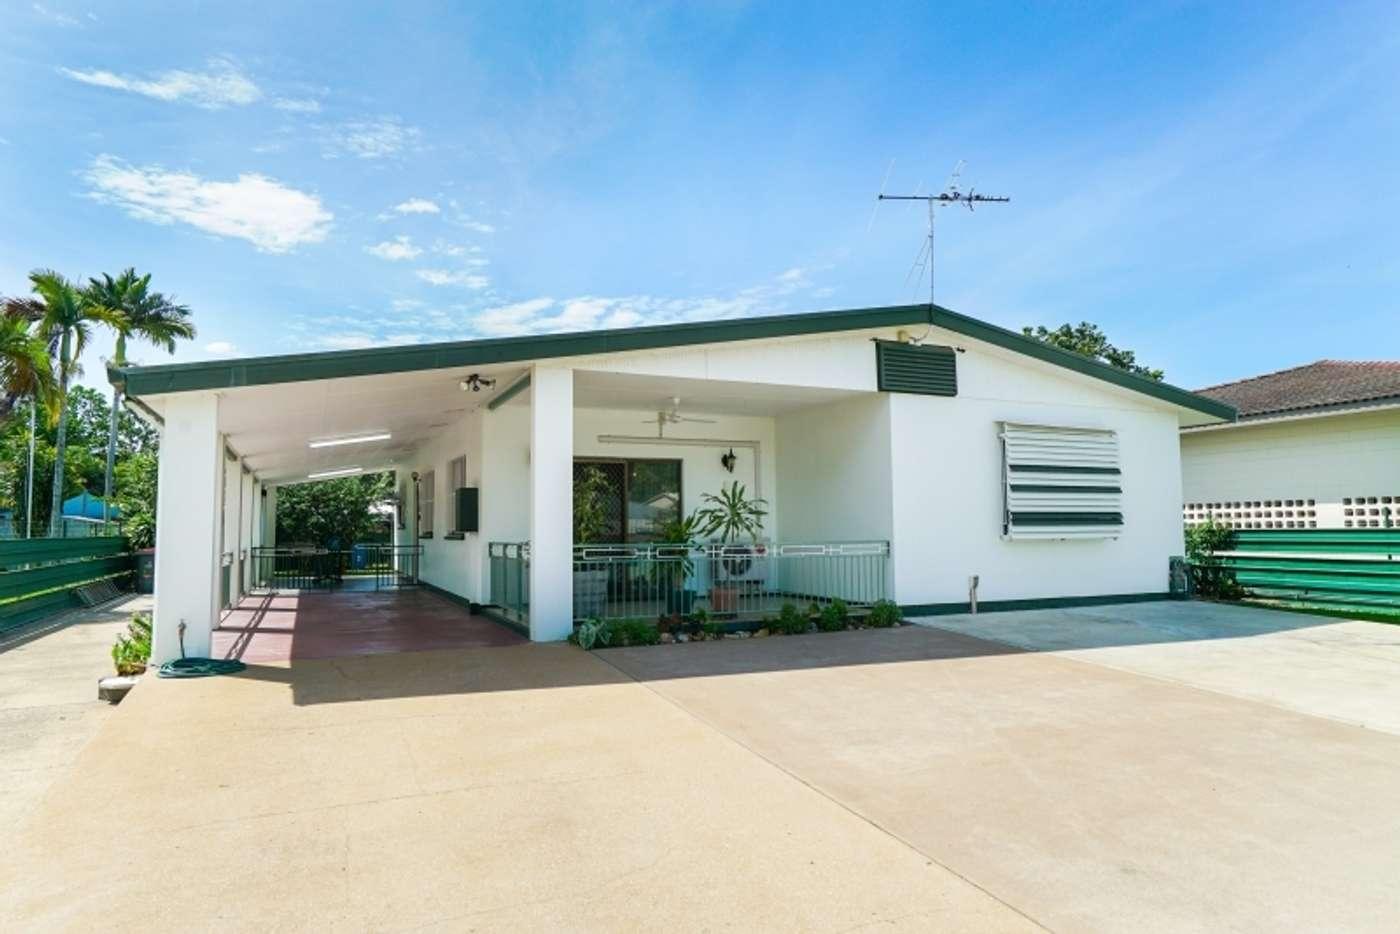 Main view of Homely house listing, 12 Kybra Court, Karama NT 812